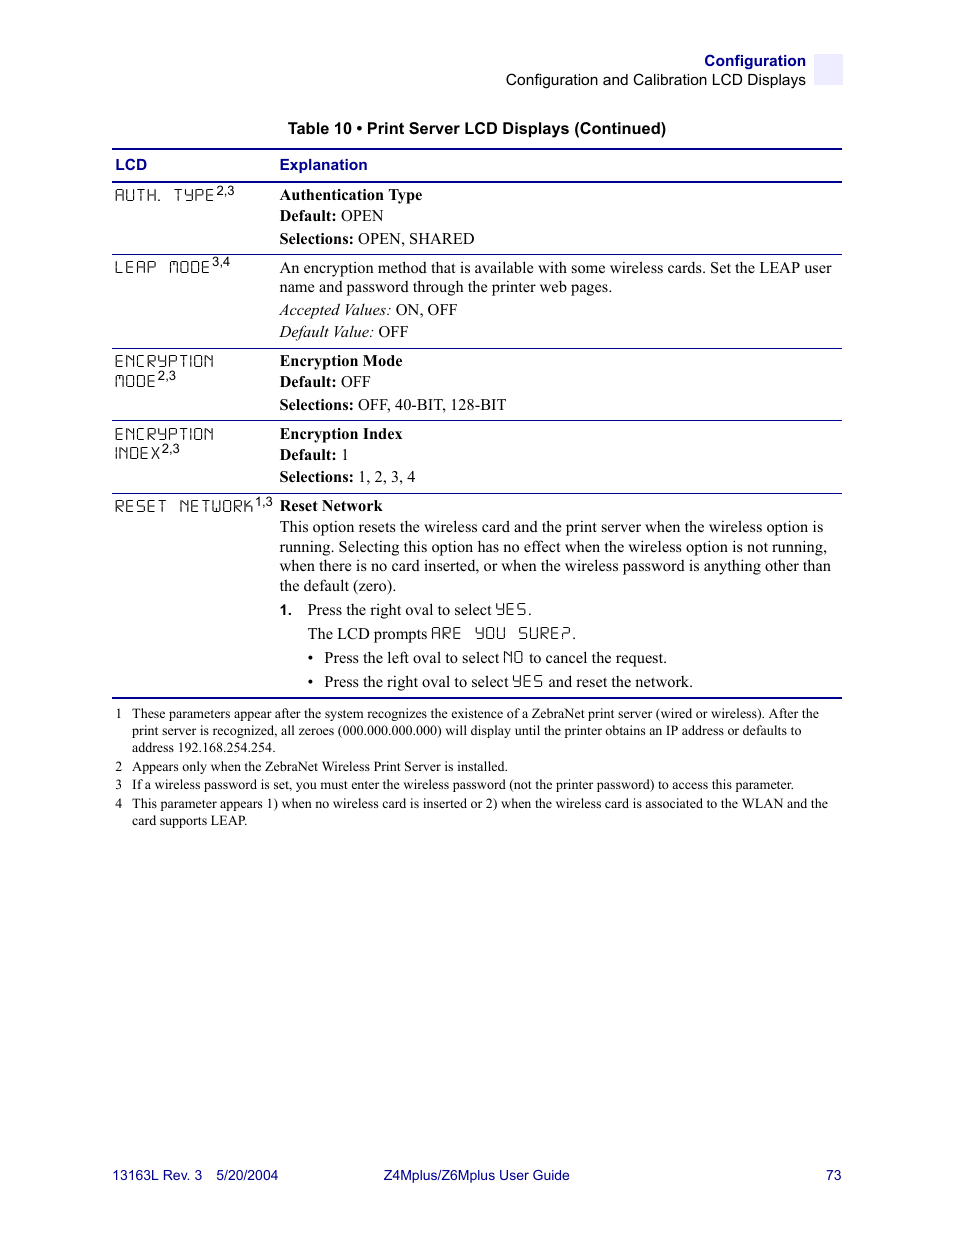 Zebra Technologies Z6Mplus User Manual | Page 91 / 142